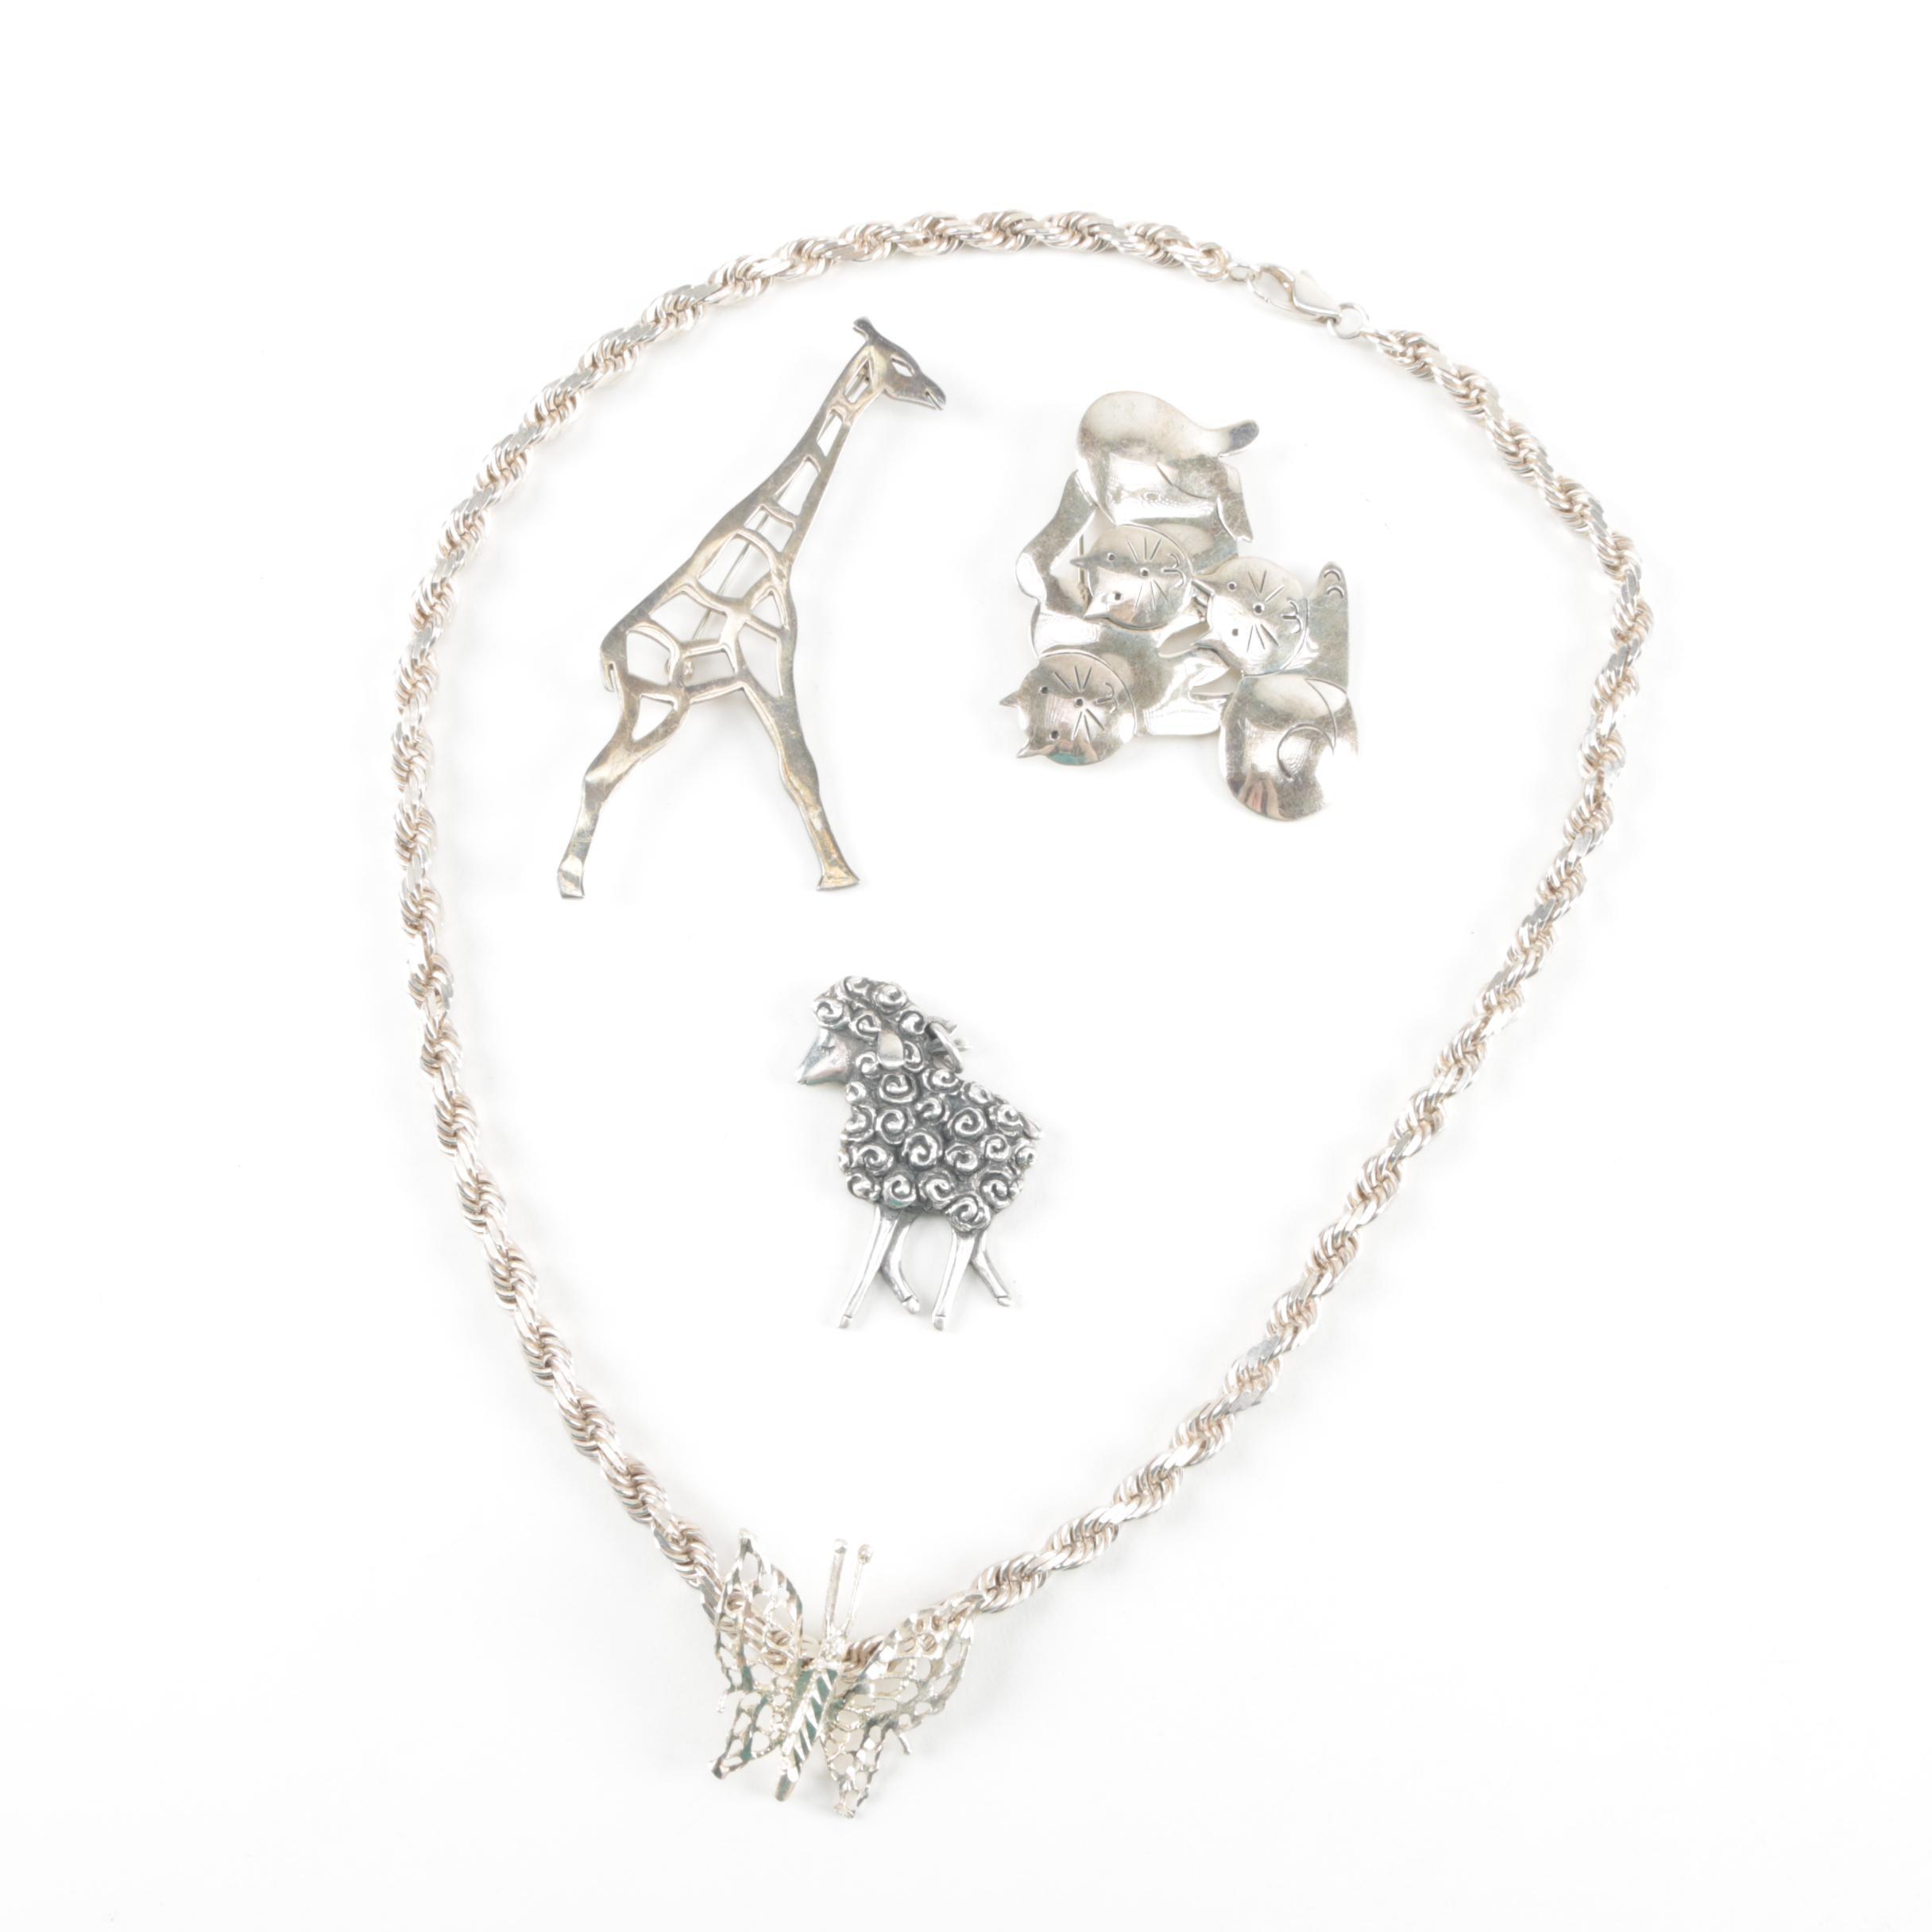 Sterling Silver Stylized Animal Jewelry